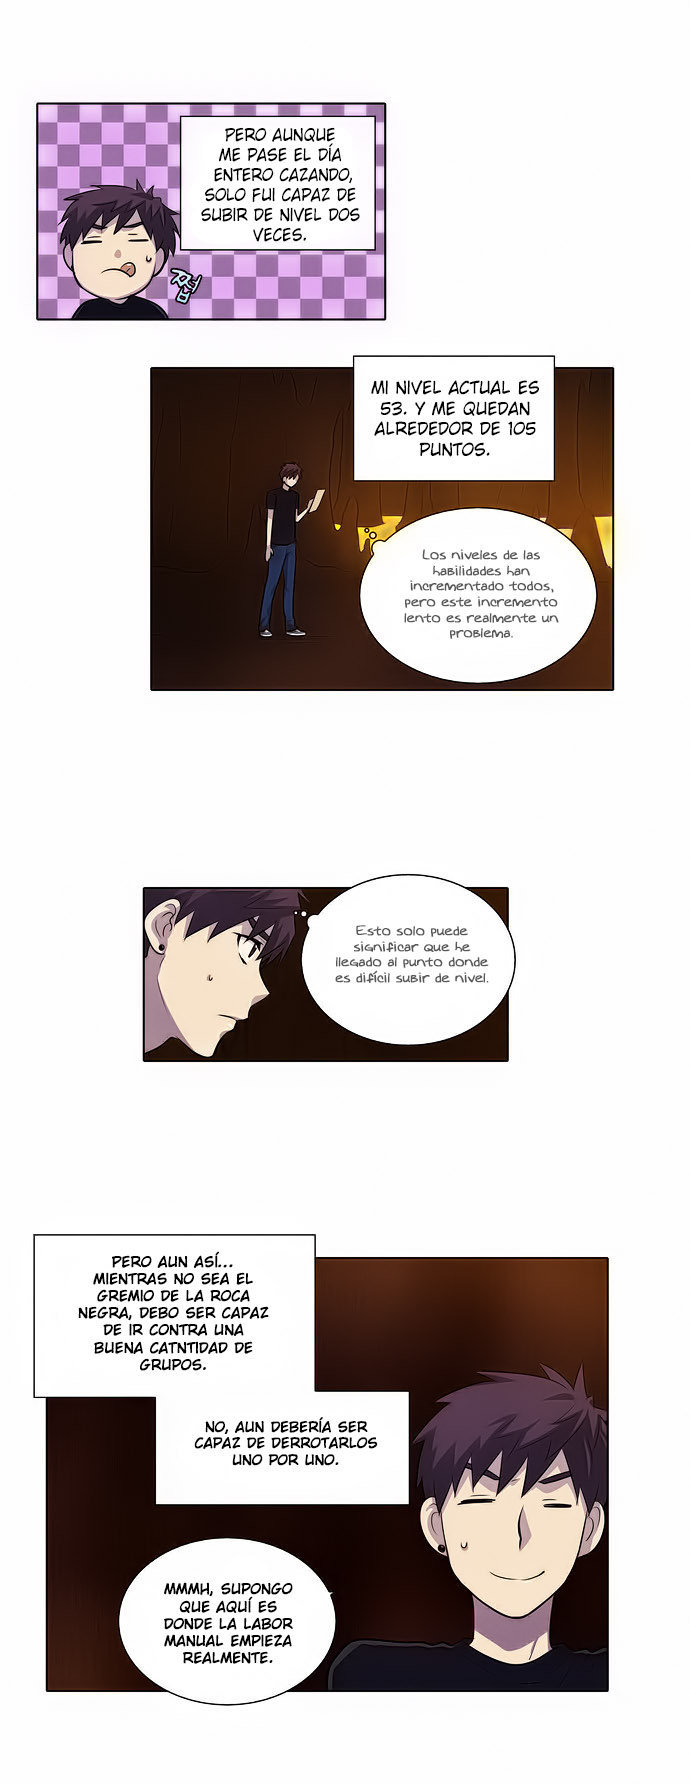 http://c5.ninemanga.com/es_manga/61/1725/439977/703aea31975f2fa45fdb3e4a8e378ad1.jpg Page 3